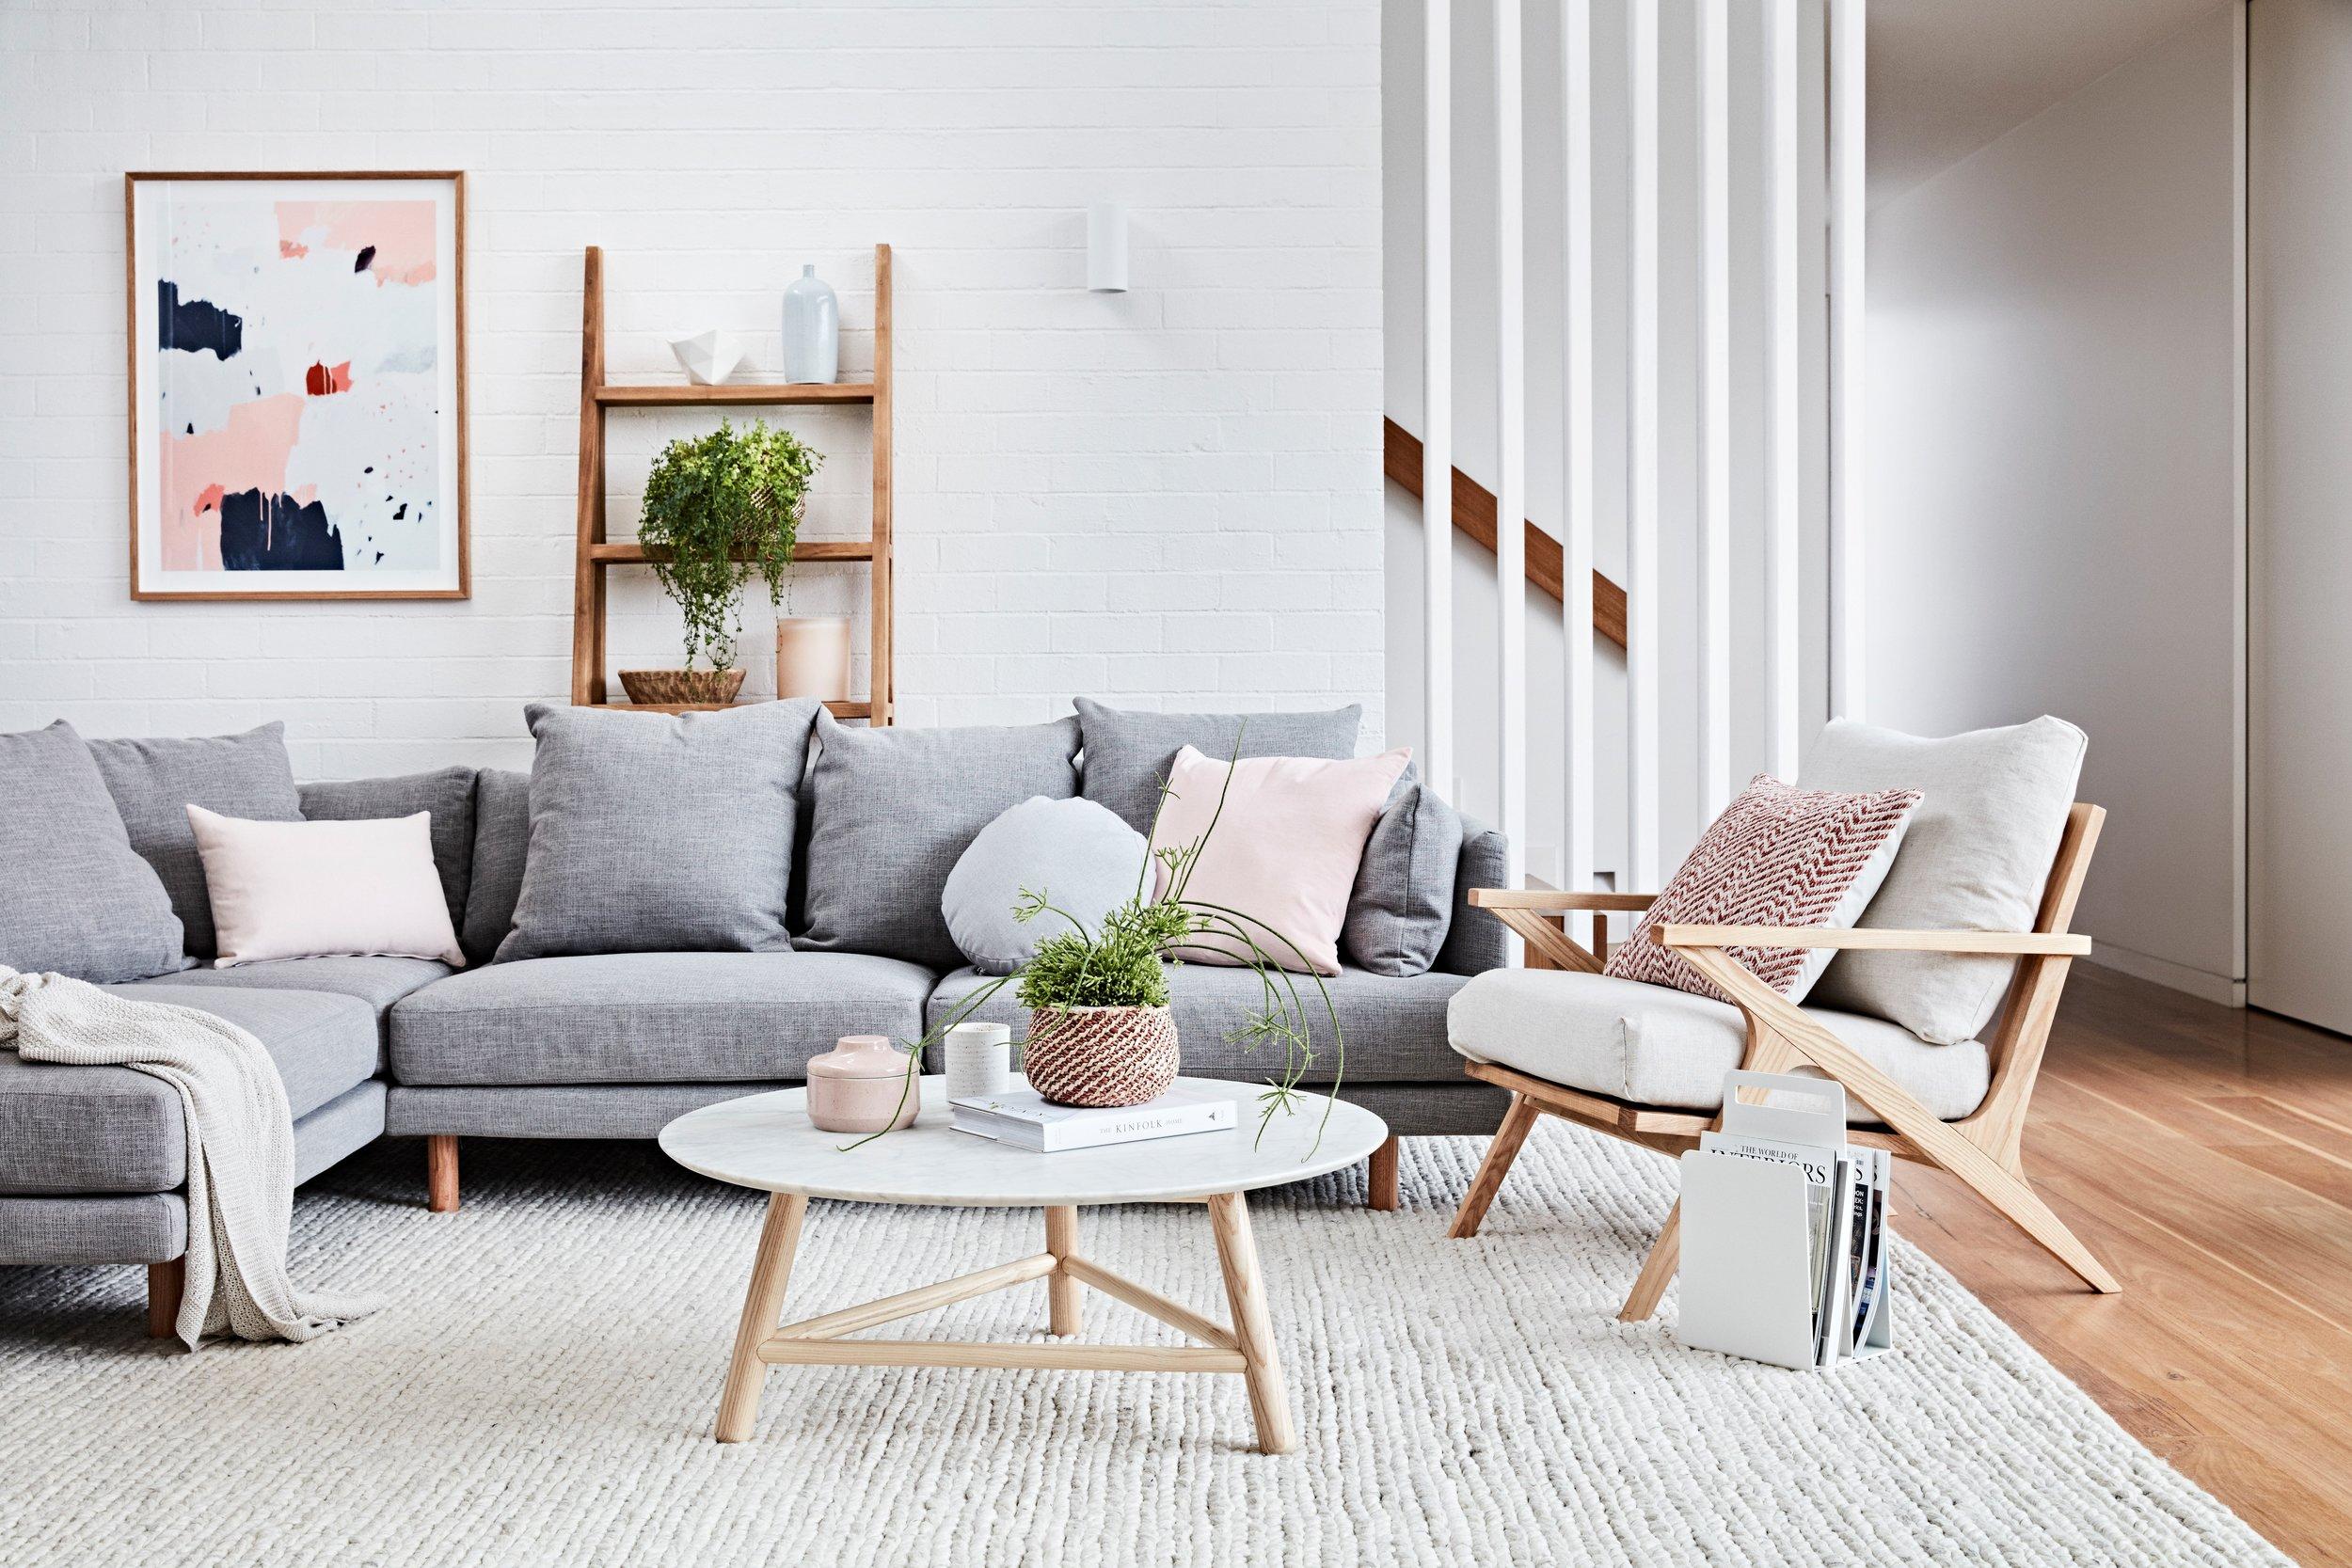 Vittoria iris sofa, vittoria folk chair, sloan coffee table & southport tall shelf GW